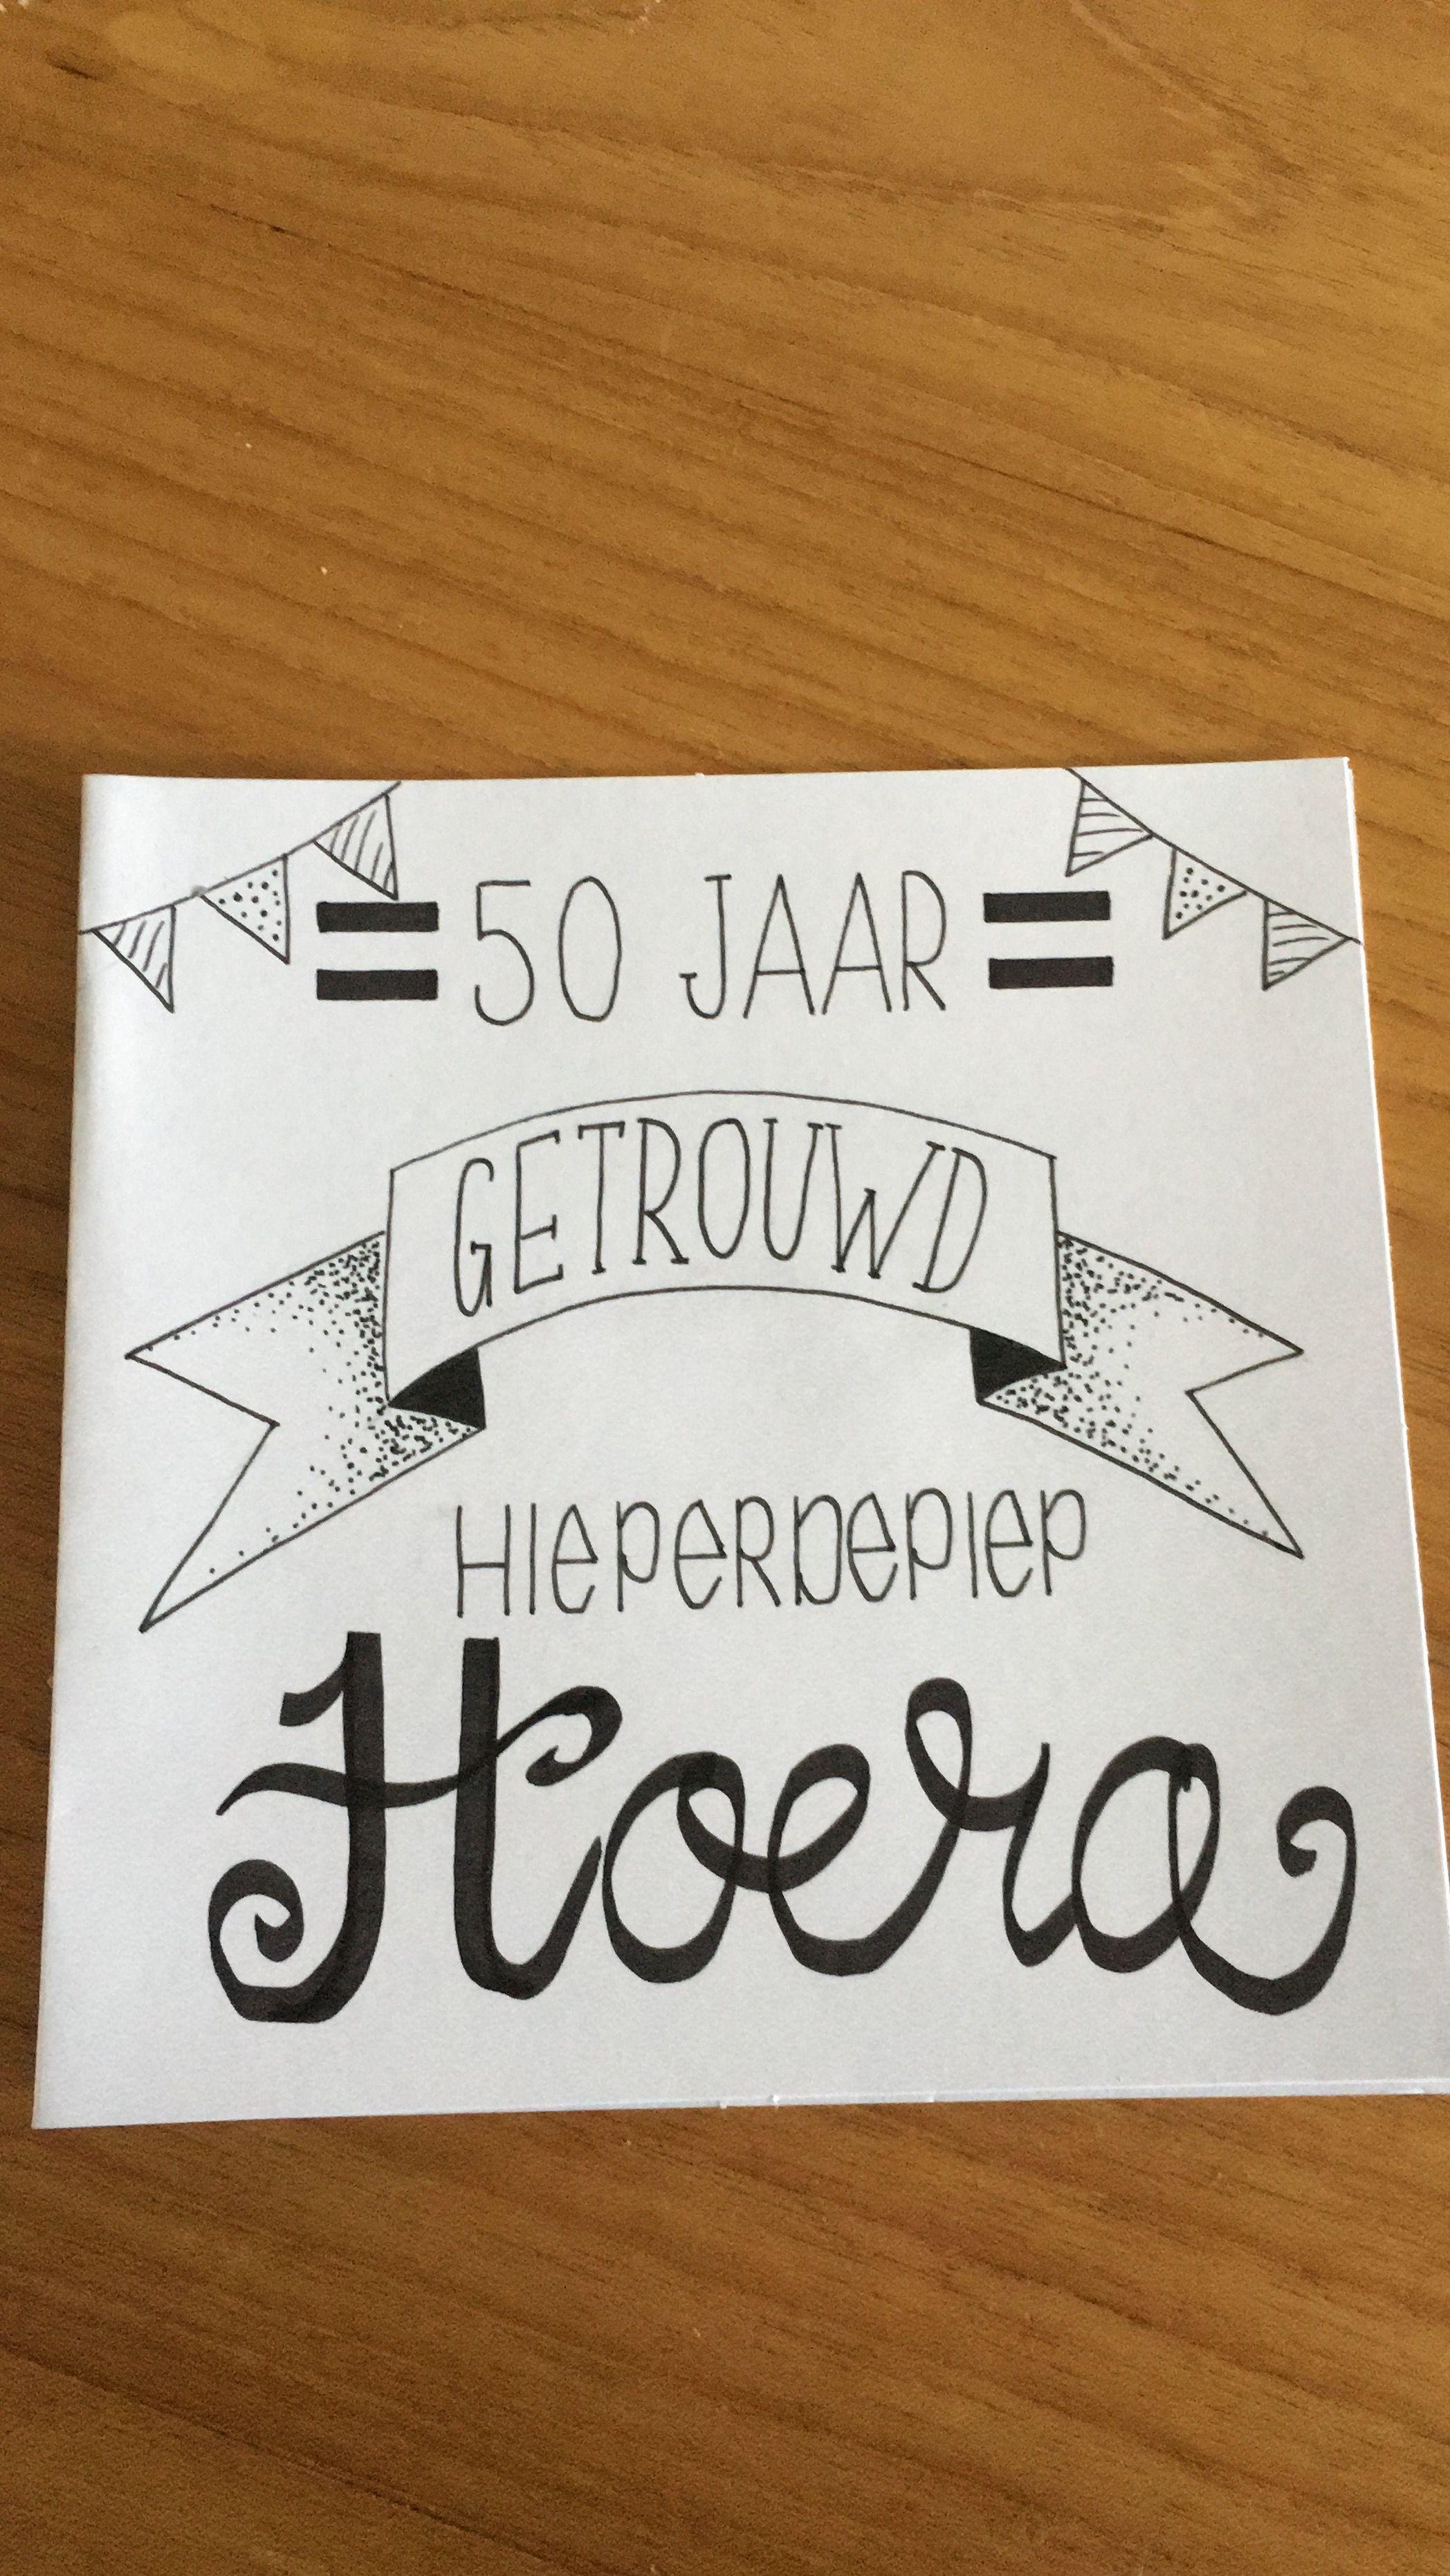 sketches 50 jaar getrouwd Handlettering getrouwd | Cards to make | Pinterest | Cards, Bullet  sketches 50 jaar getrouwd